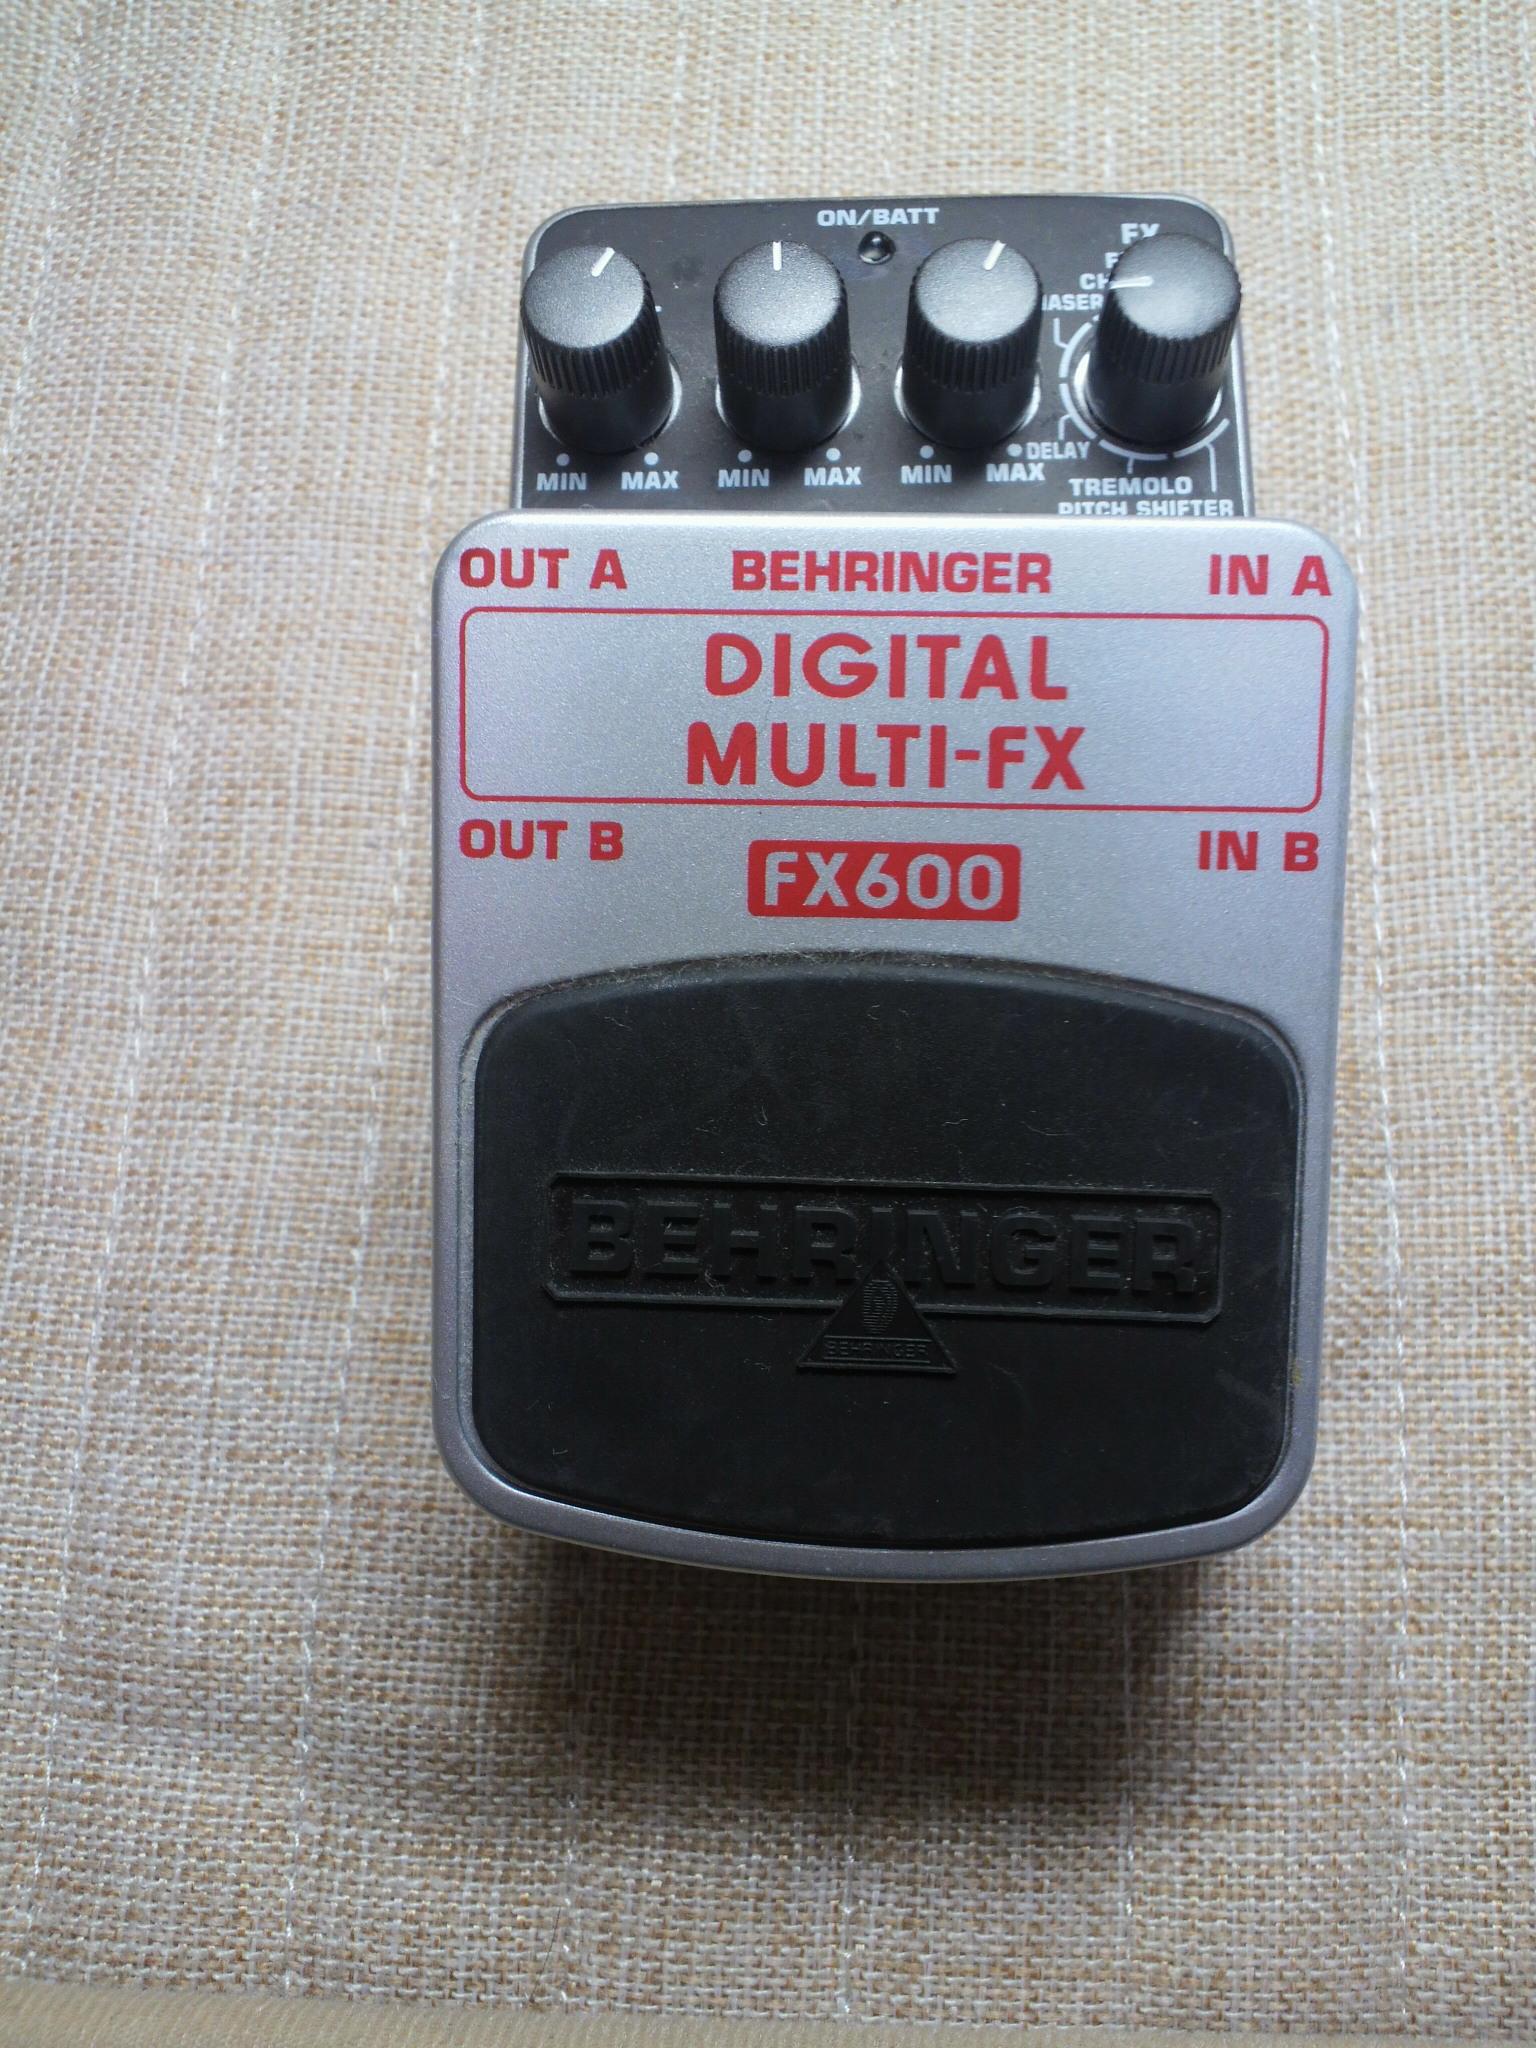 DCIM0152FX.jpg